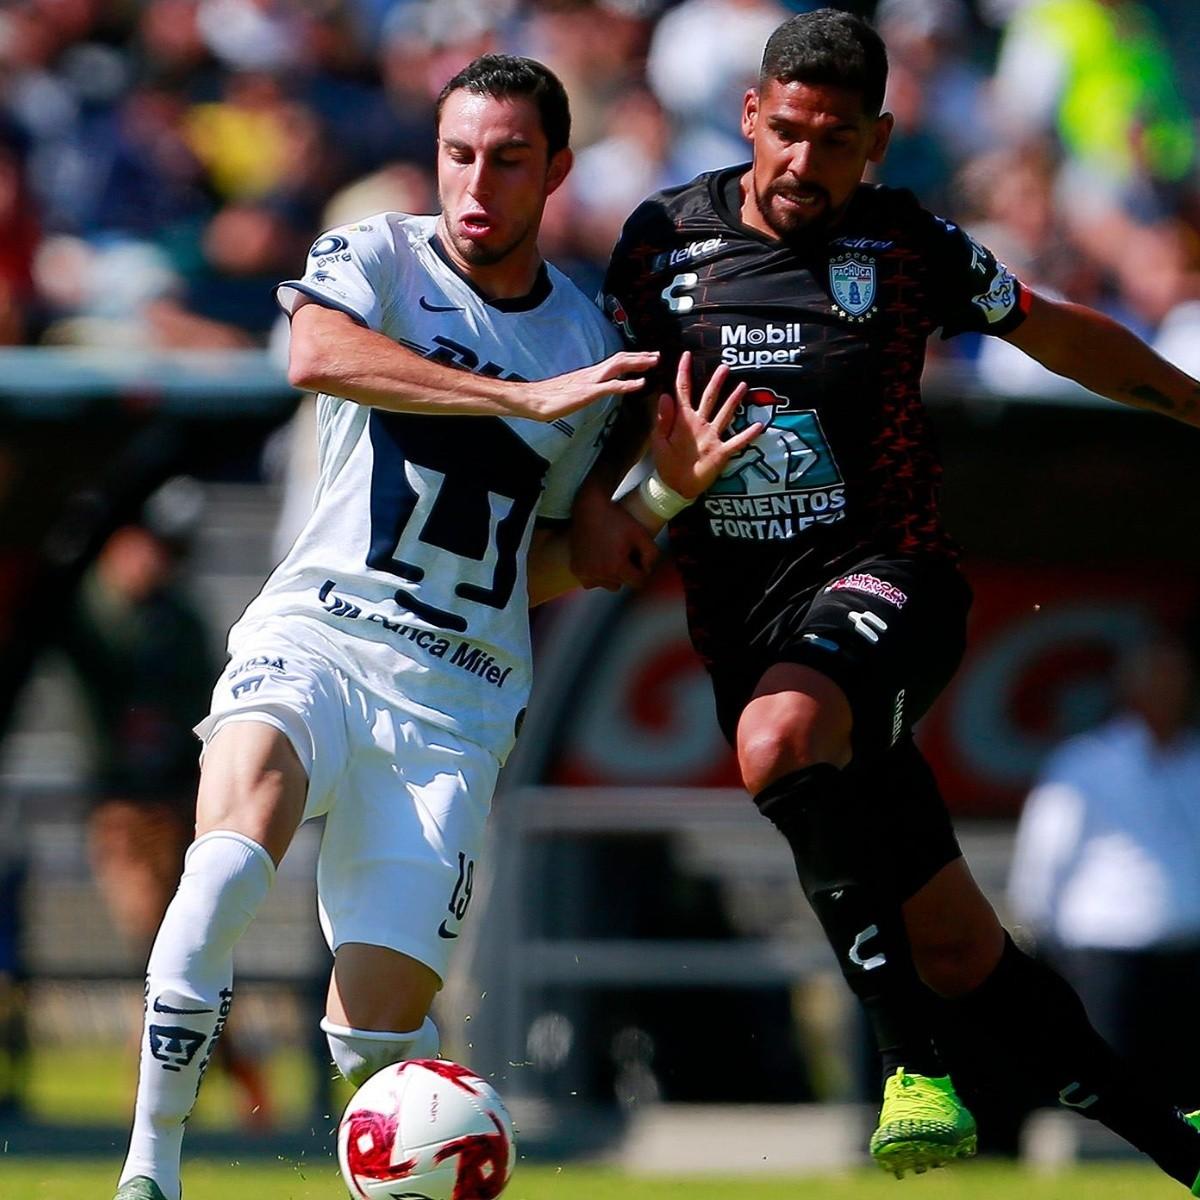 Ligeramente heroína Peligro  Pachuca vs. Pumas ver en vivo el duelo por la Liga MX | Dale Pumas